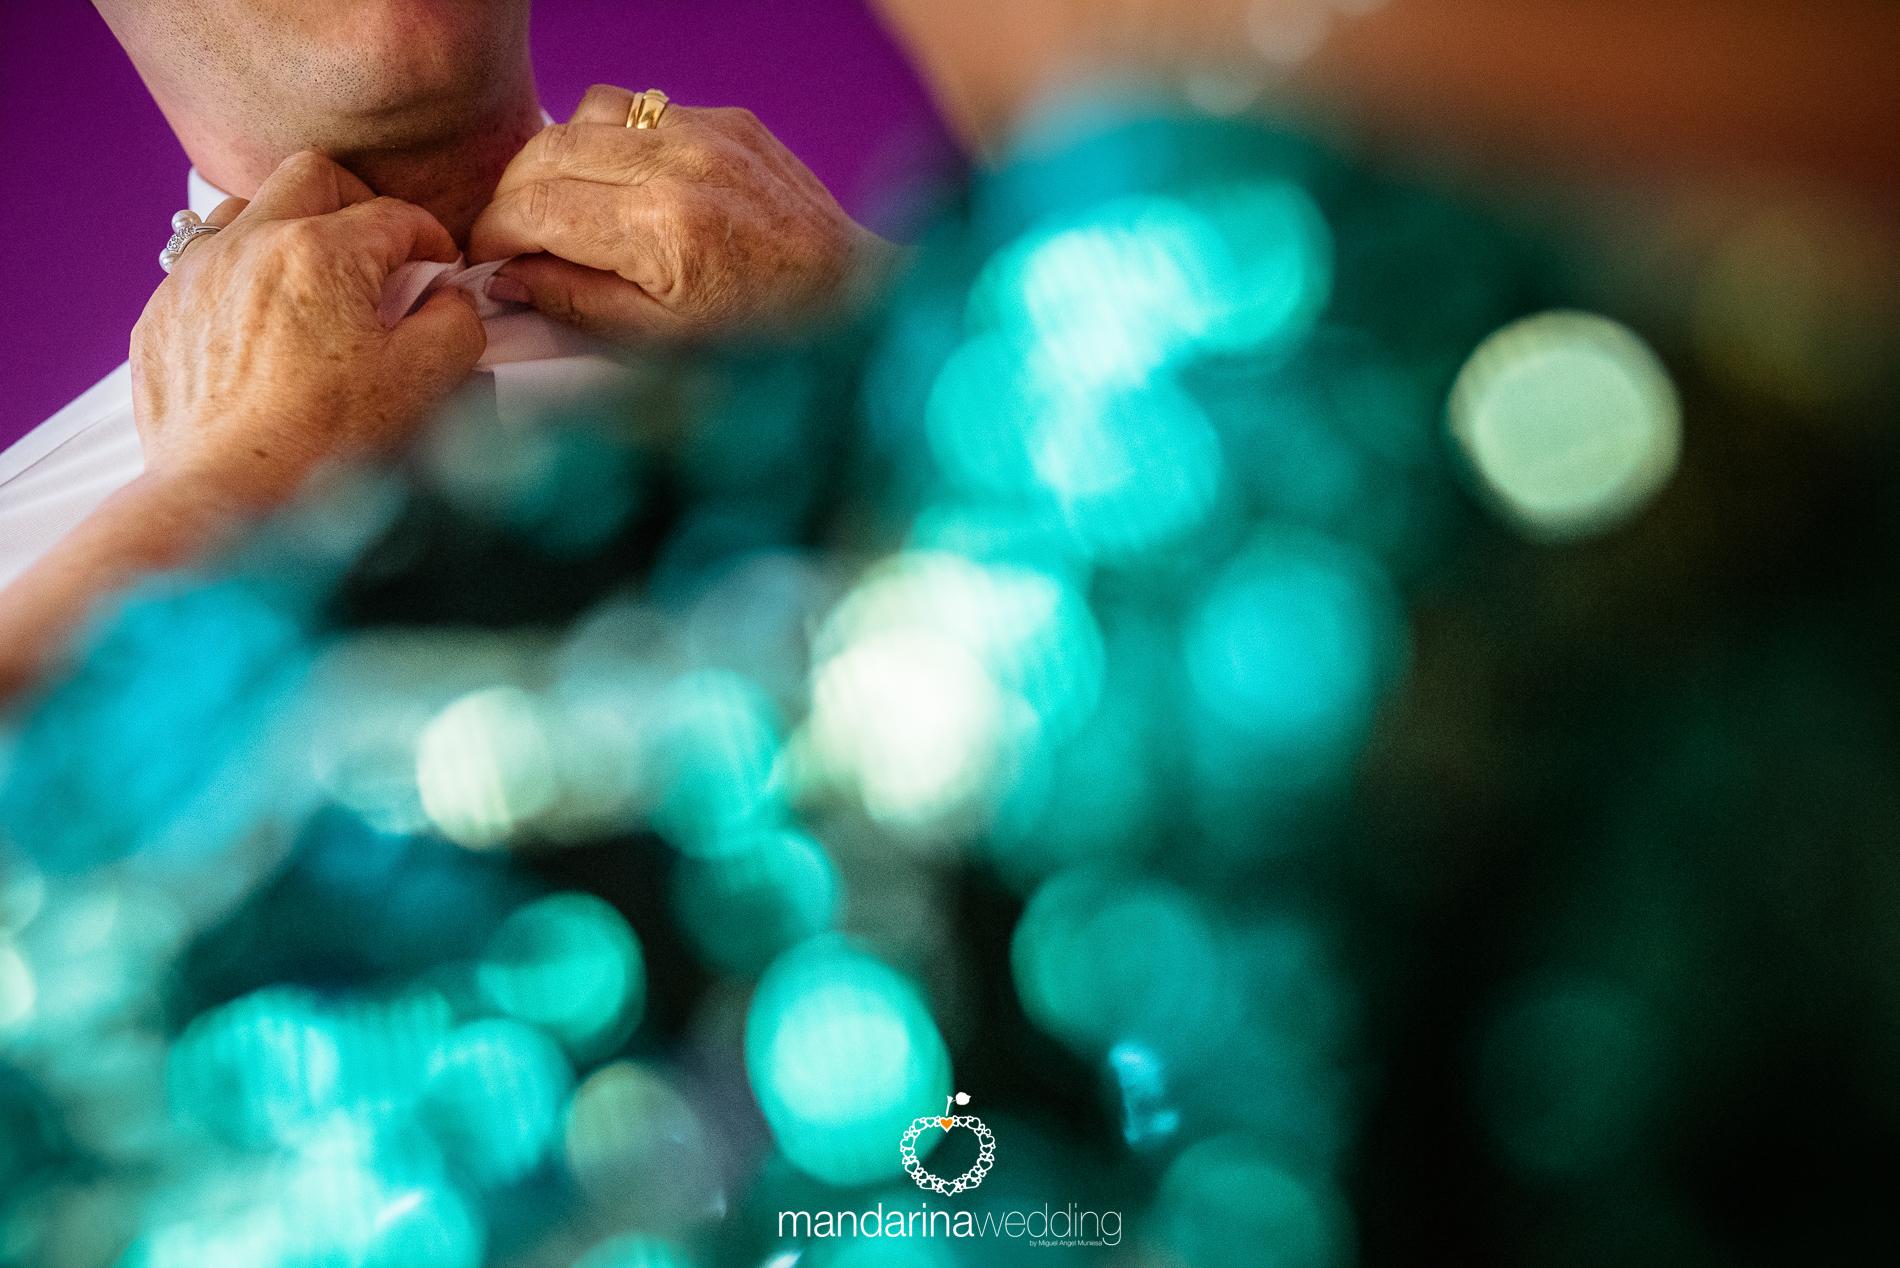 mandarina wedding, mejores fotografos boda, fotografo zaragoza, fotografo huesca, fotografo soria, fotografo lerida_54